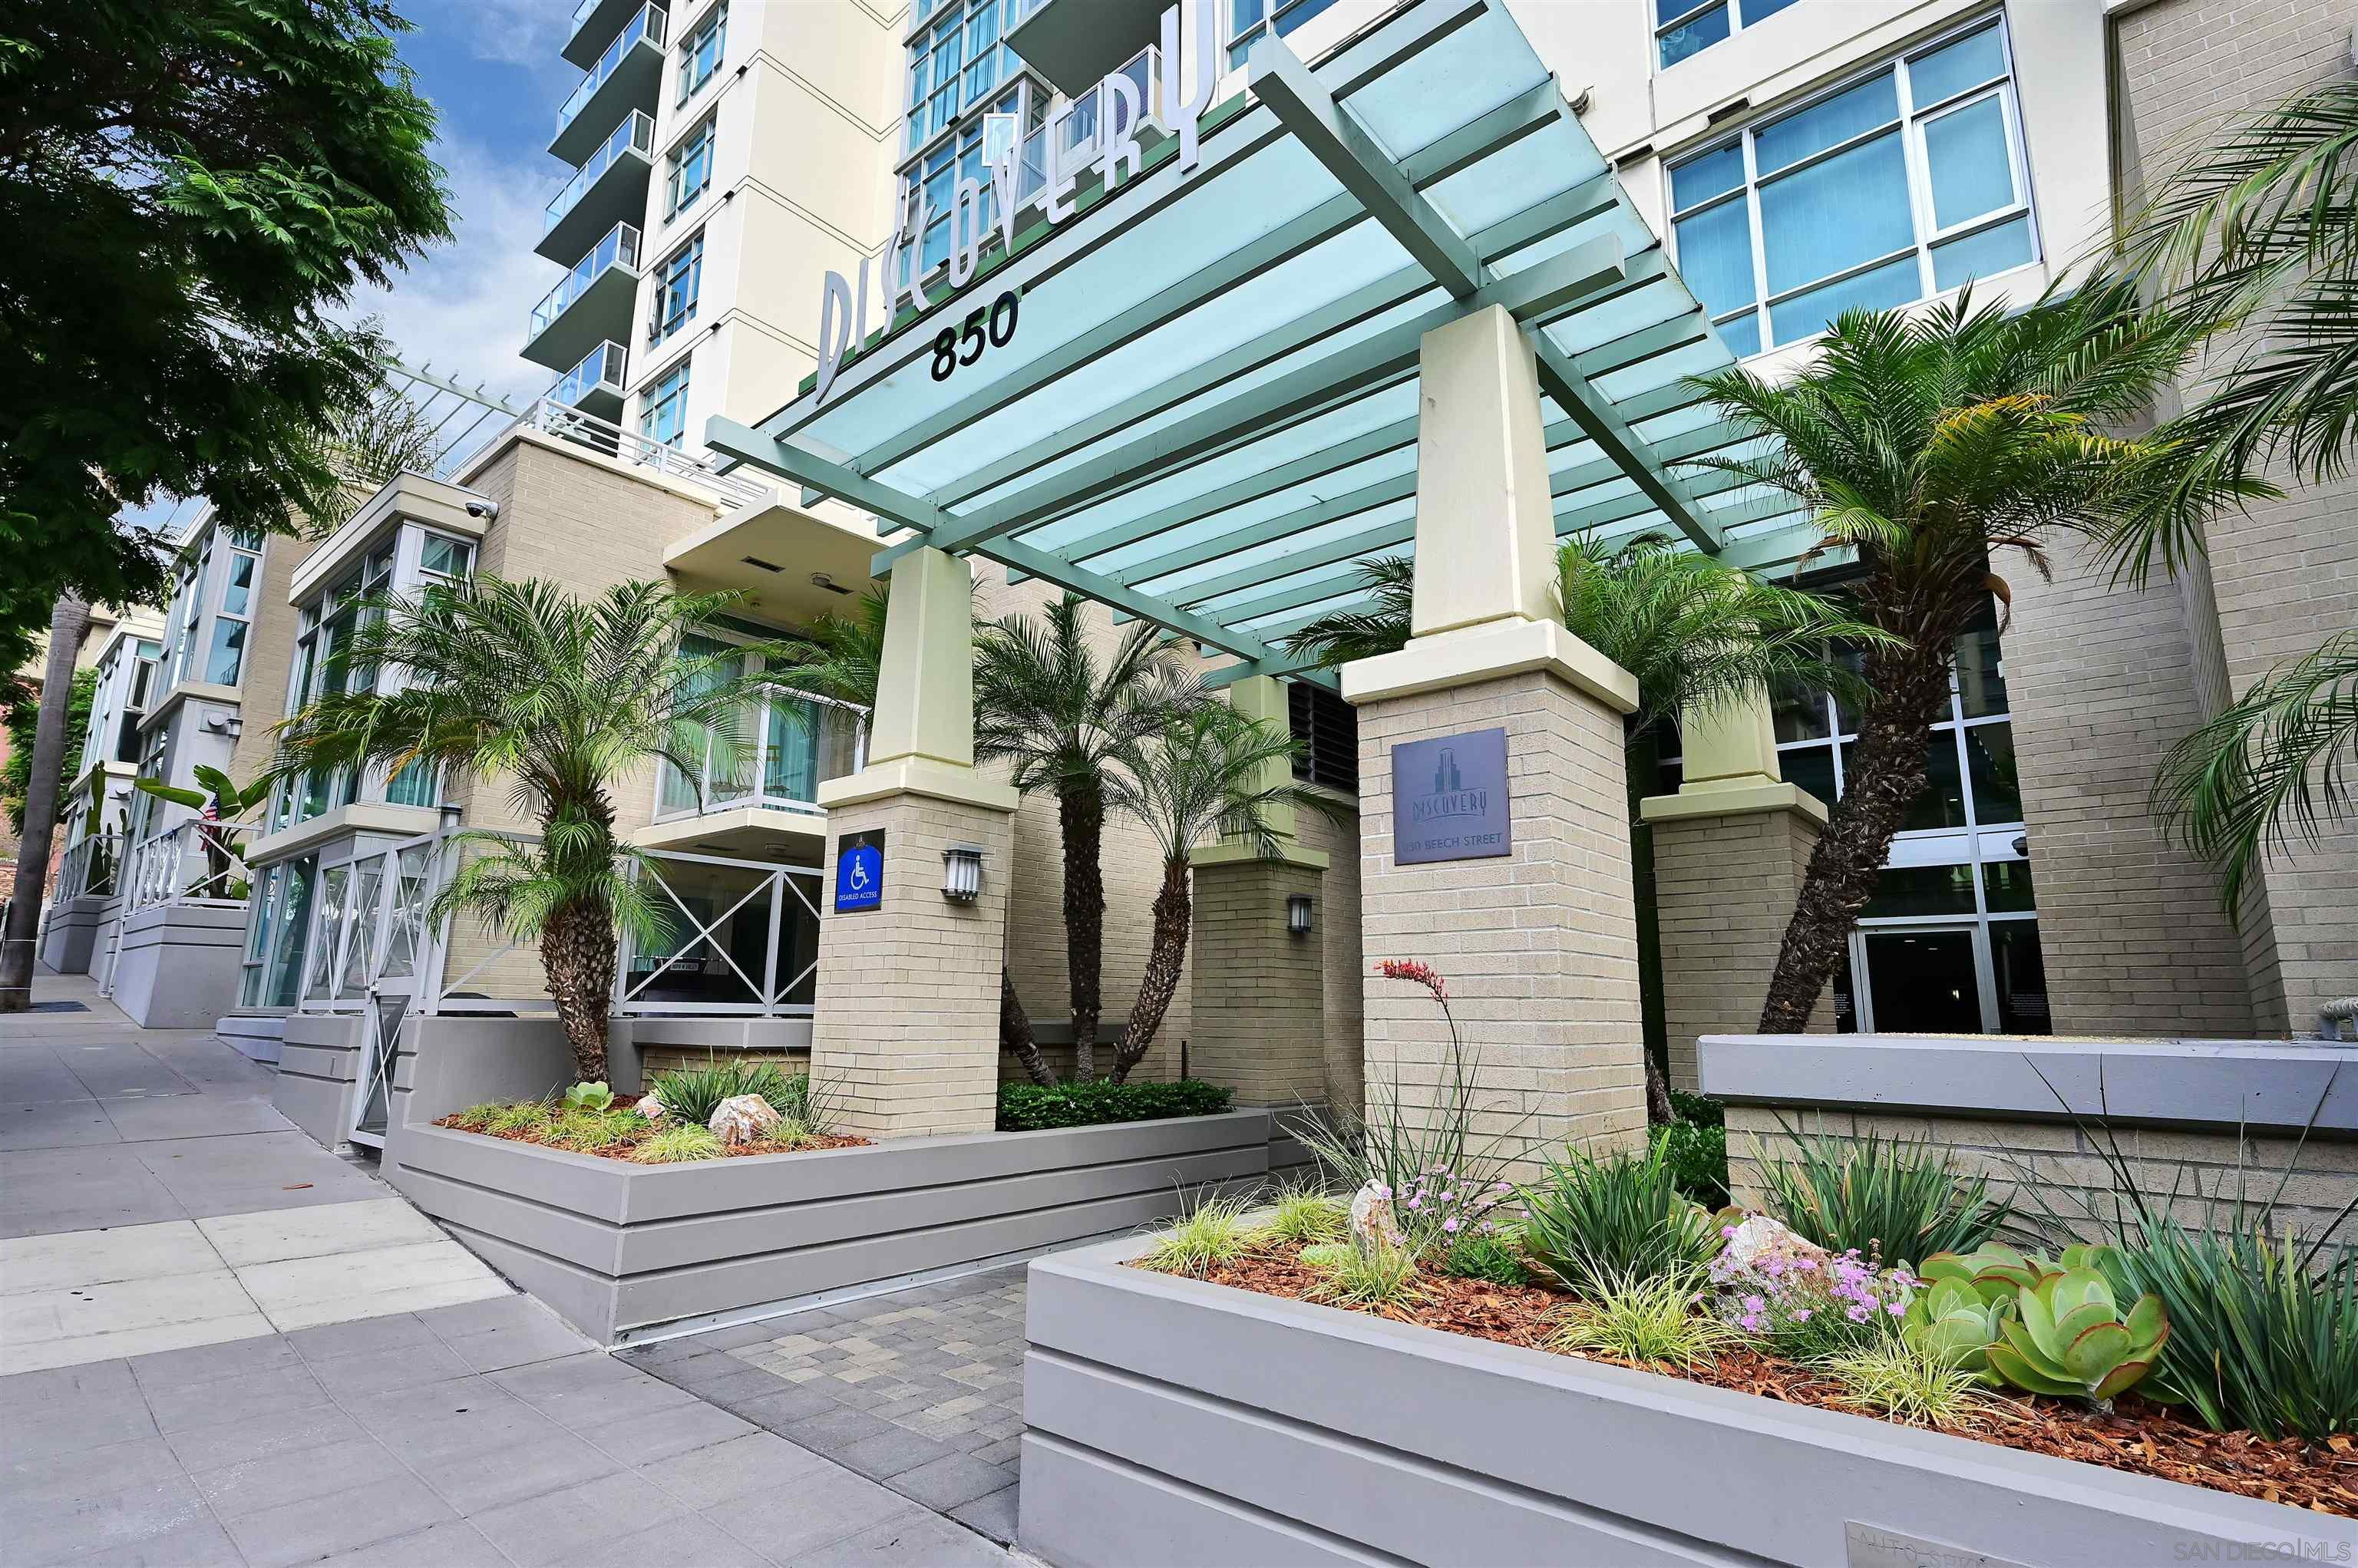 850 Beech St. 617, San Diego, CA 92101